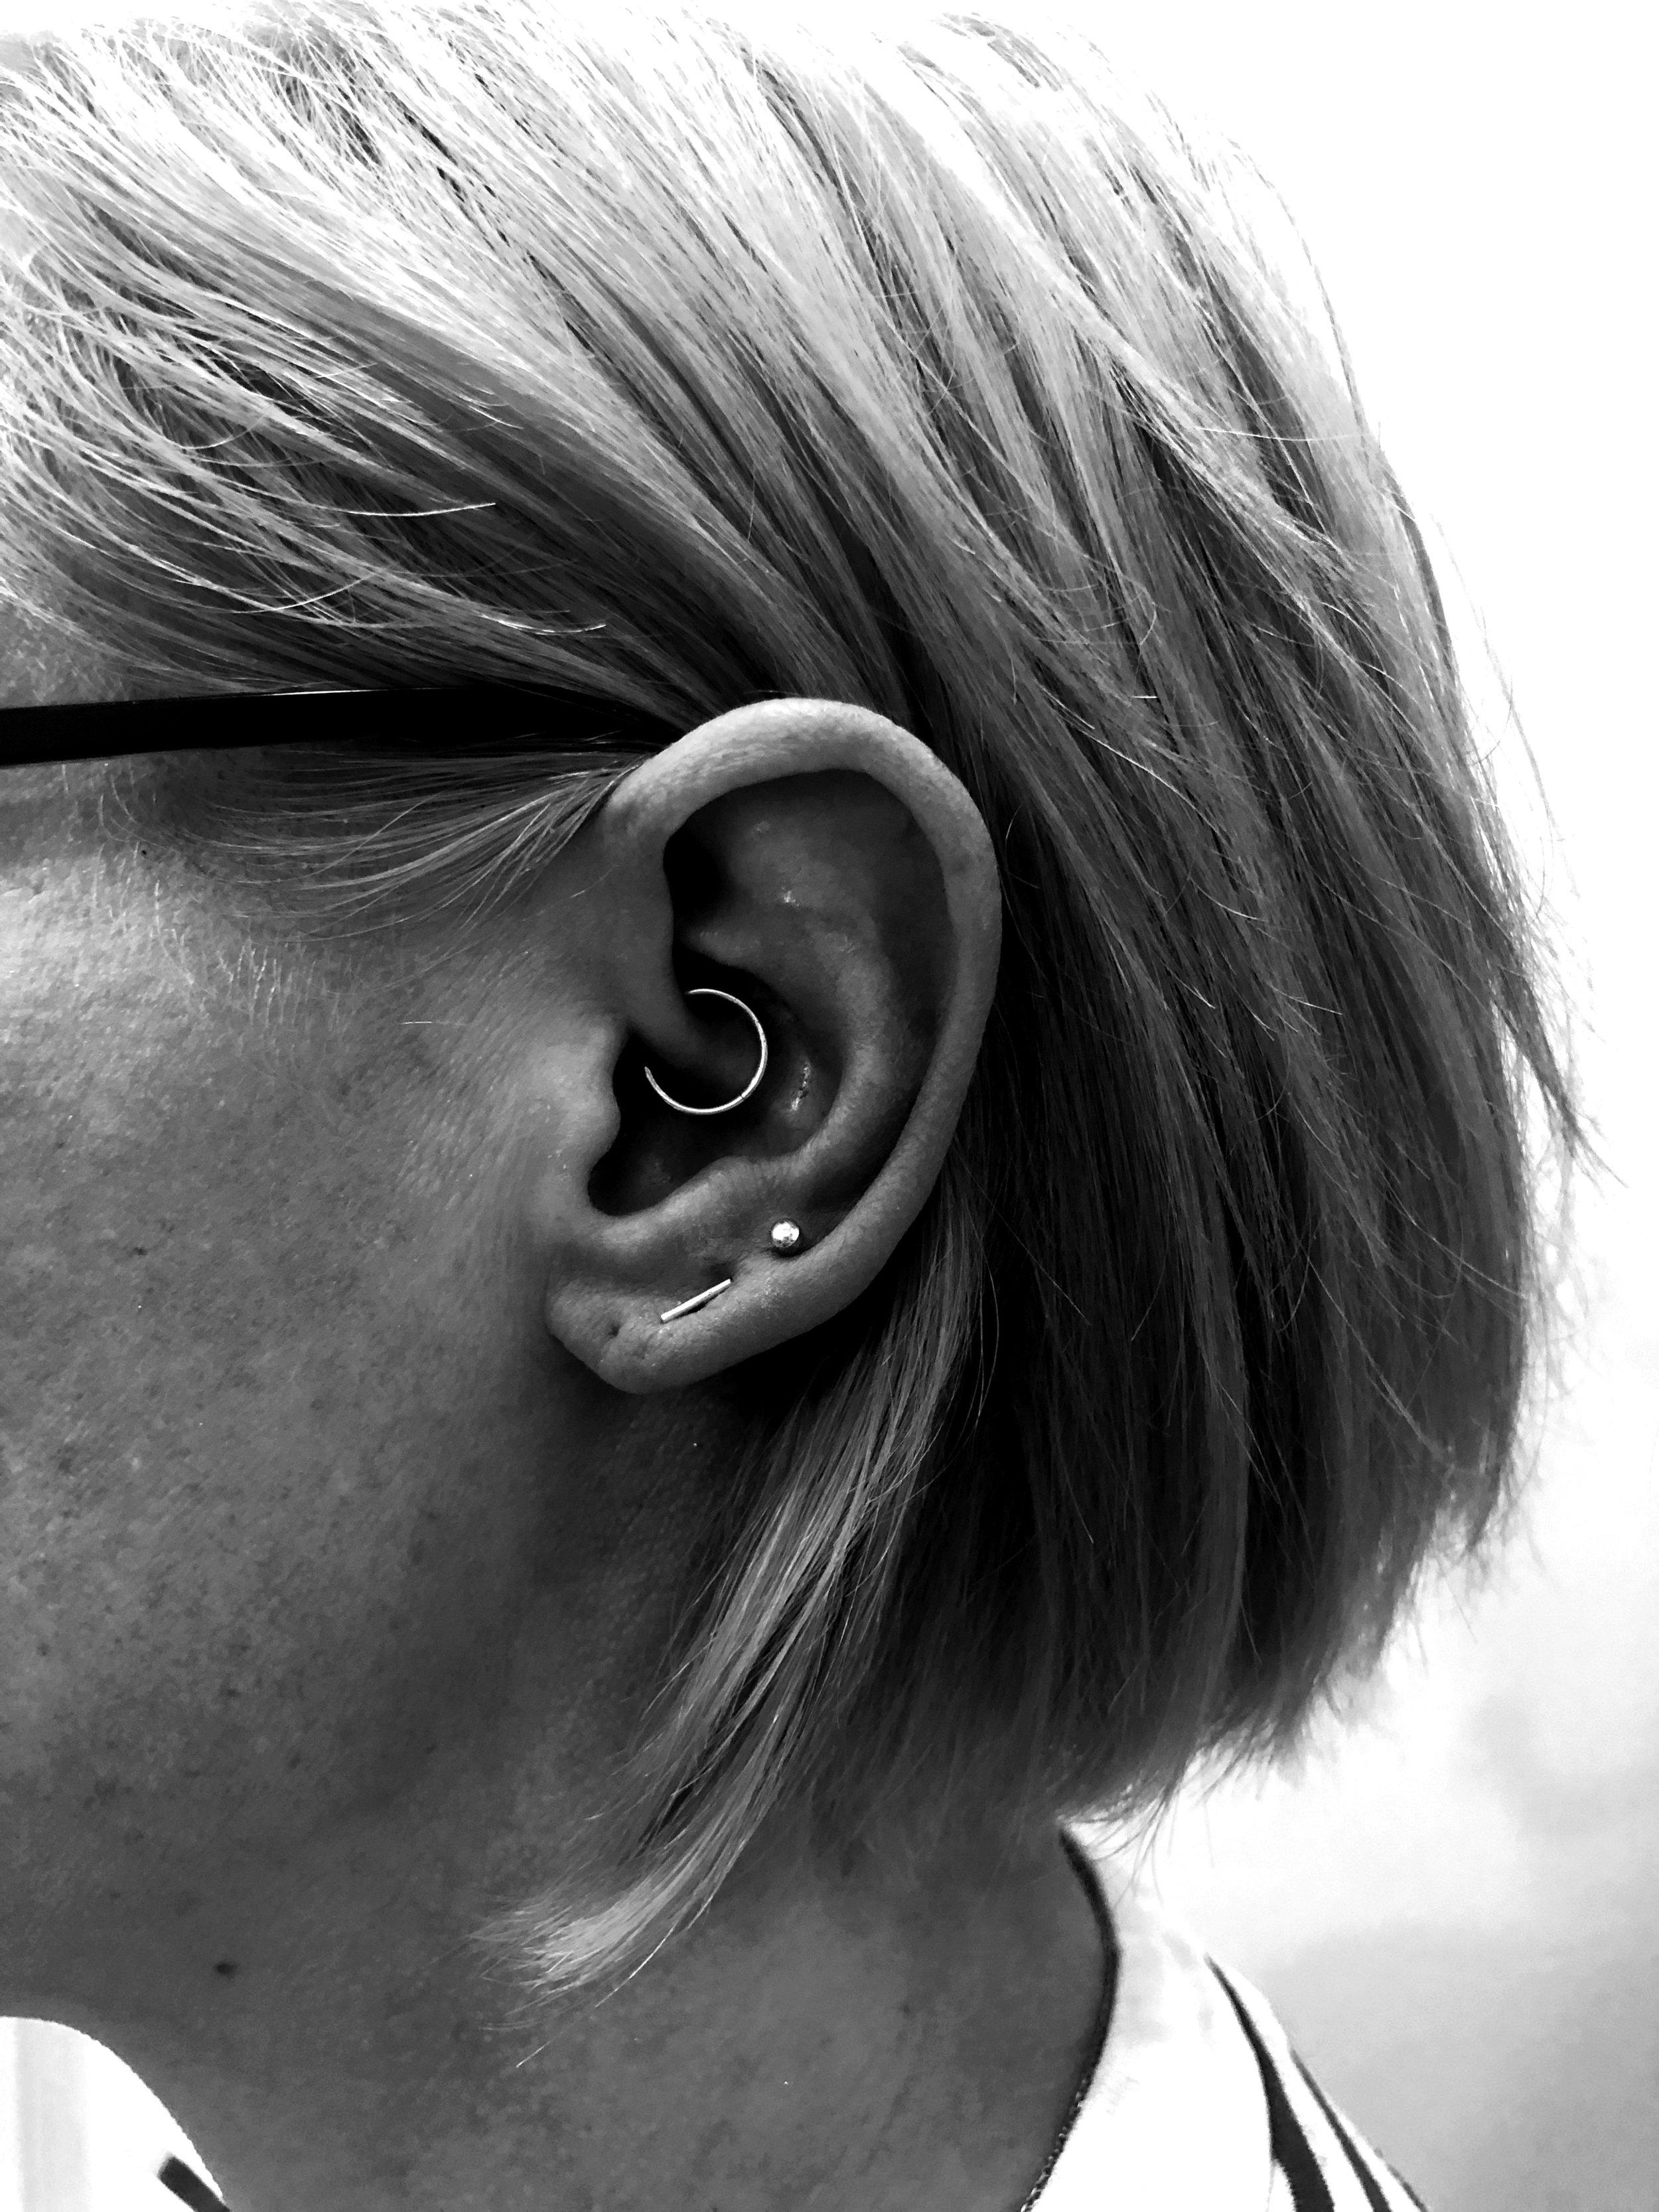 Beautiful Daith piercing alongside existing lobe piercings